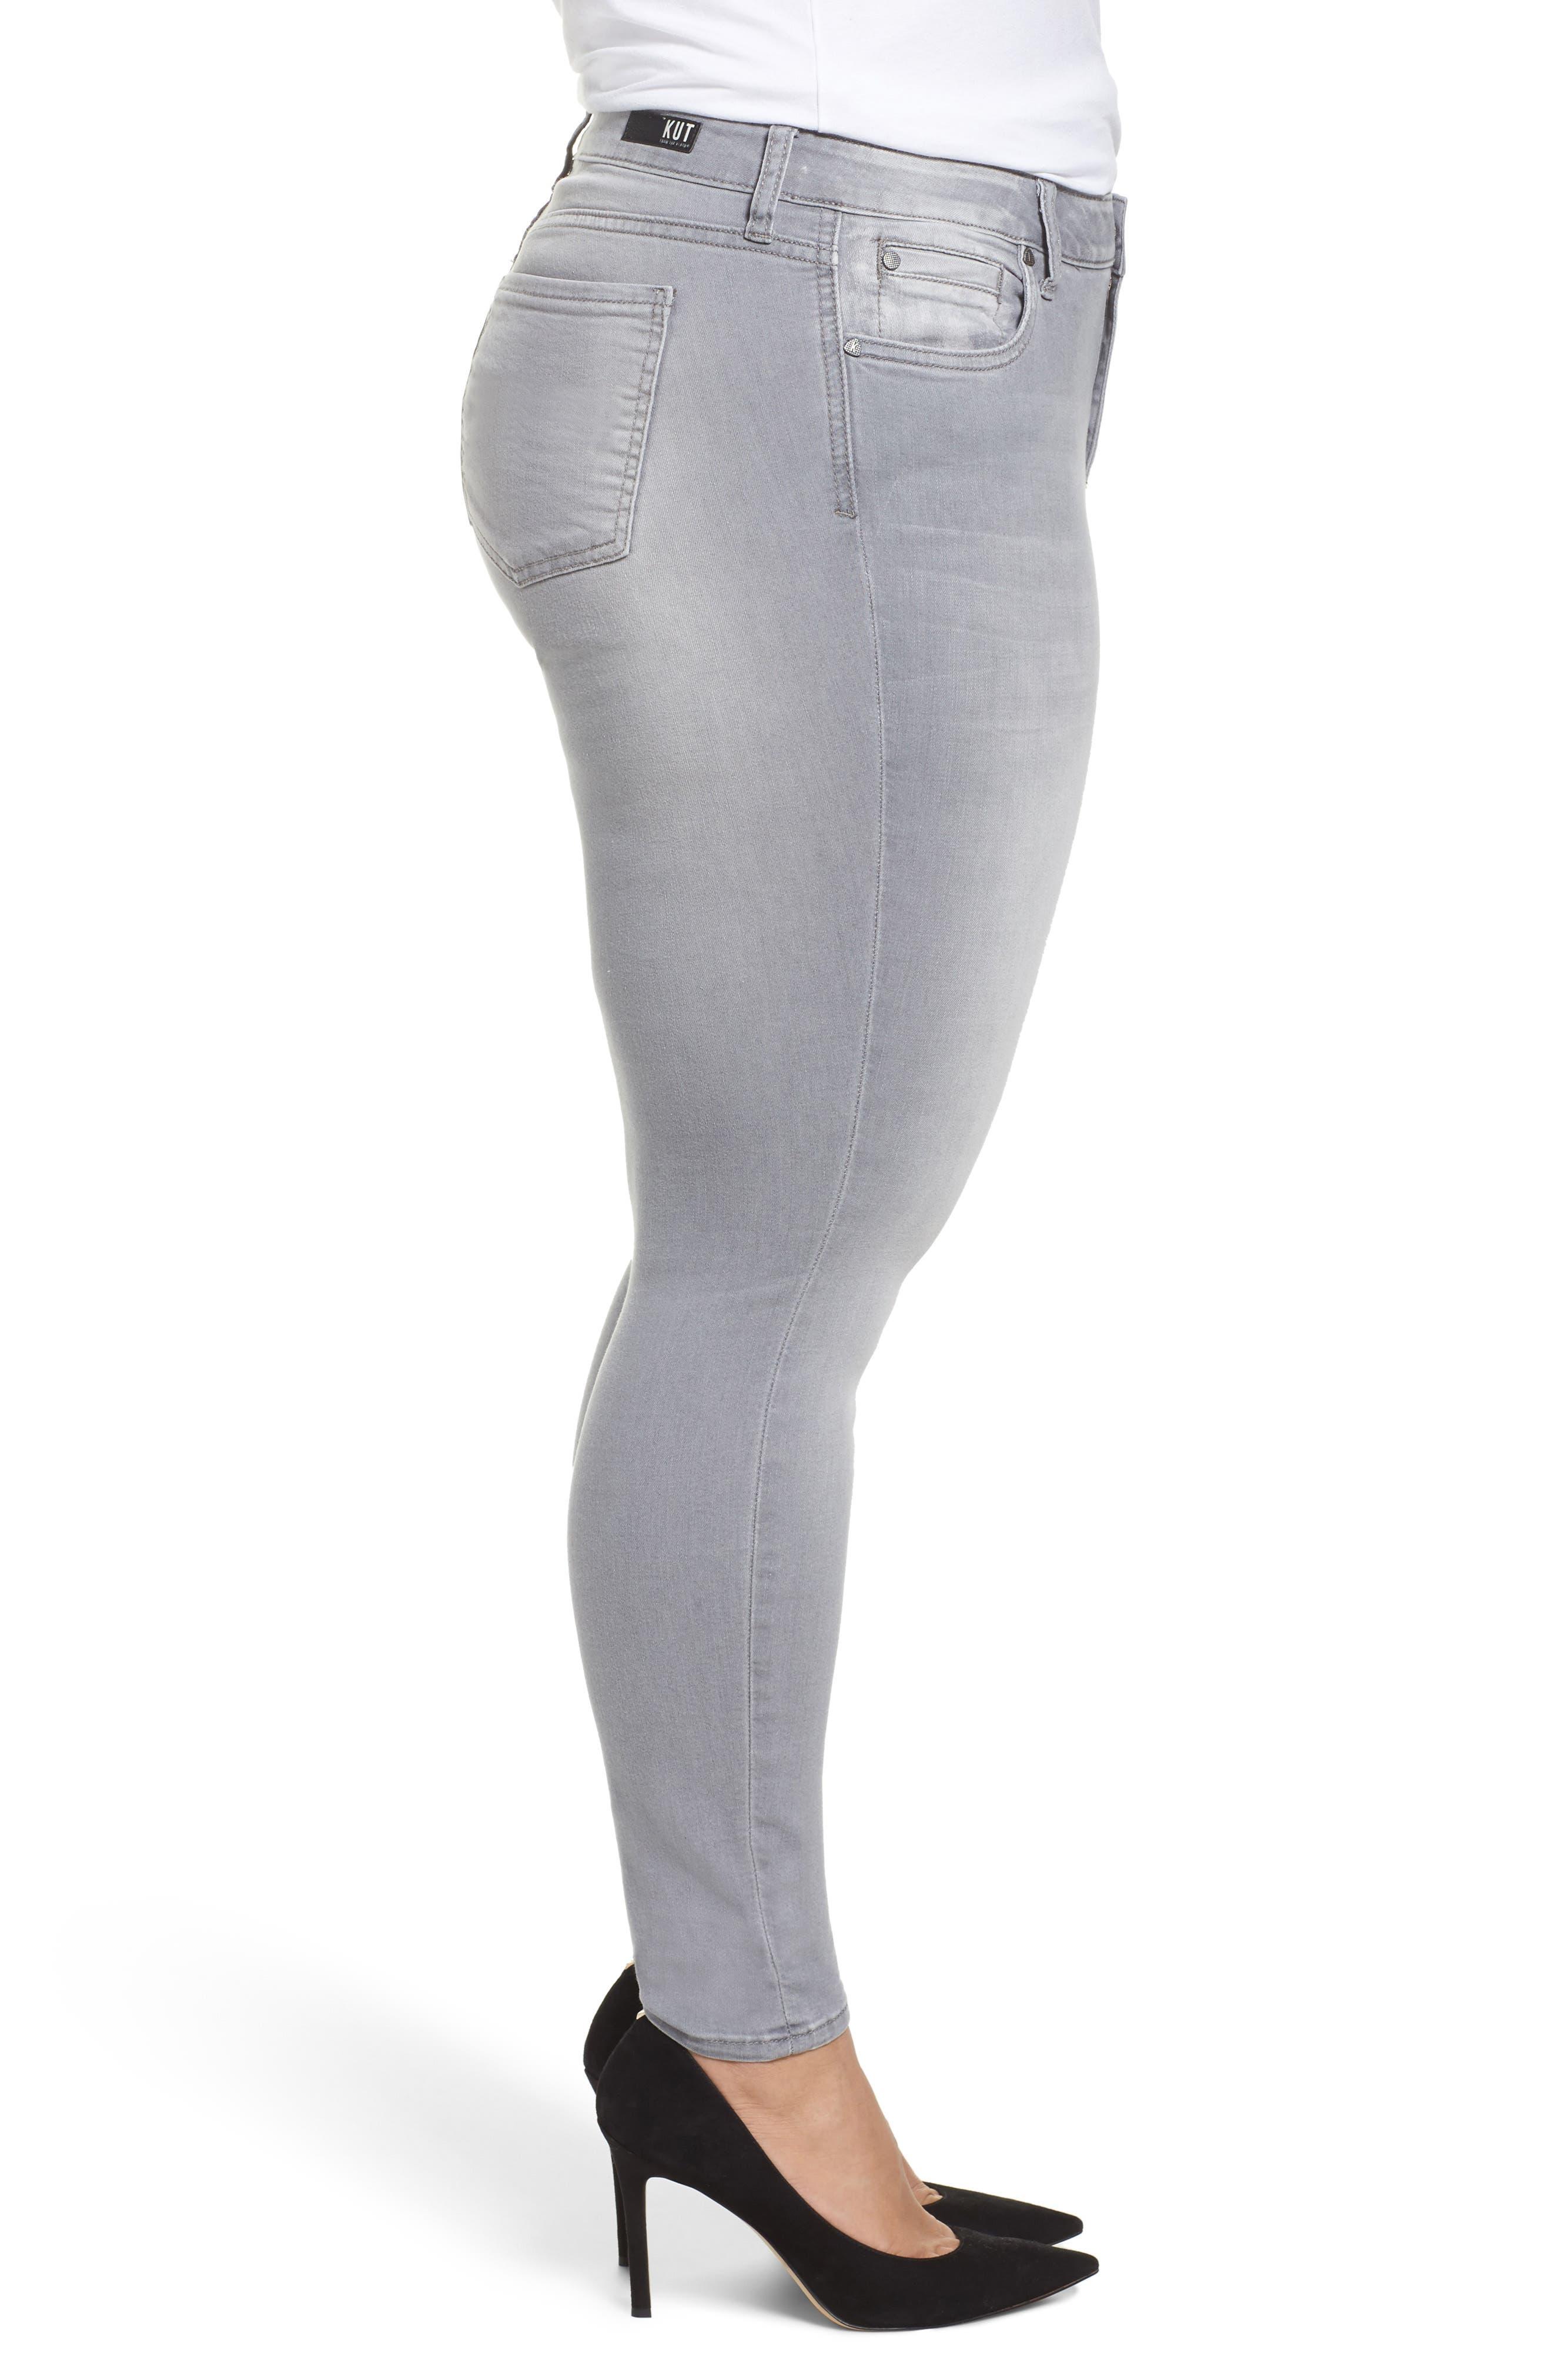 Mia Skinny Jeans,                             Alternate thumbnail 3, color,                             Prevailed